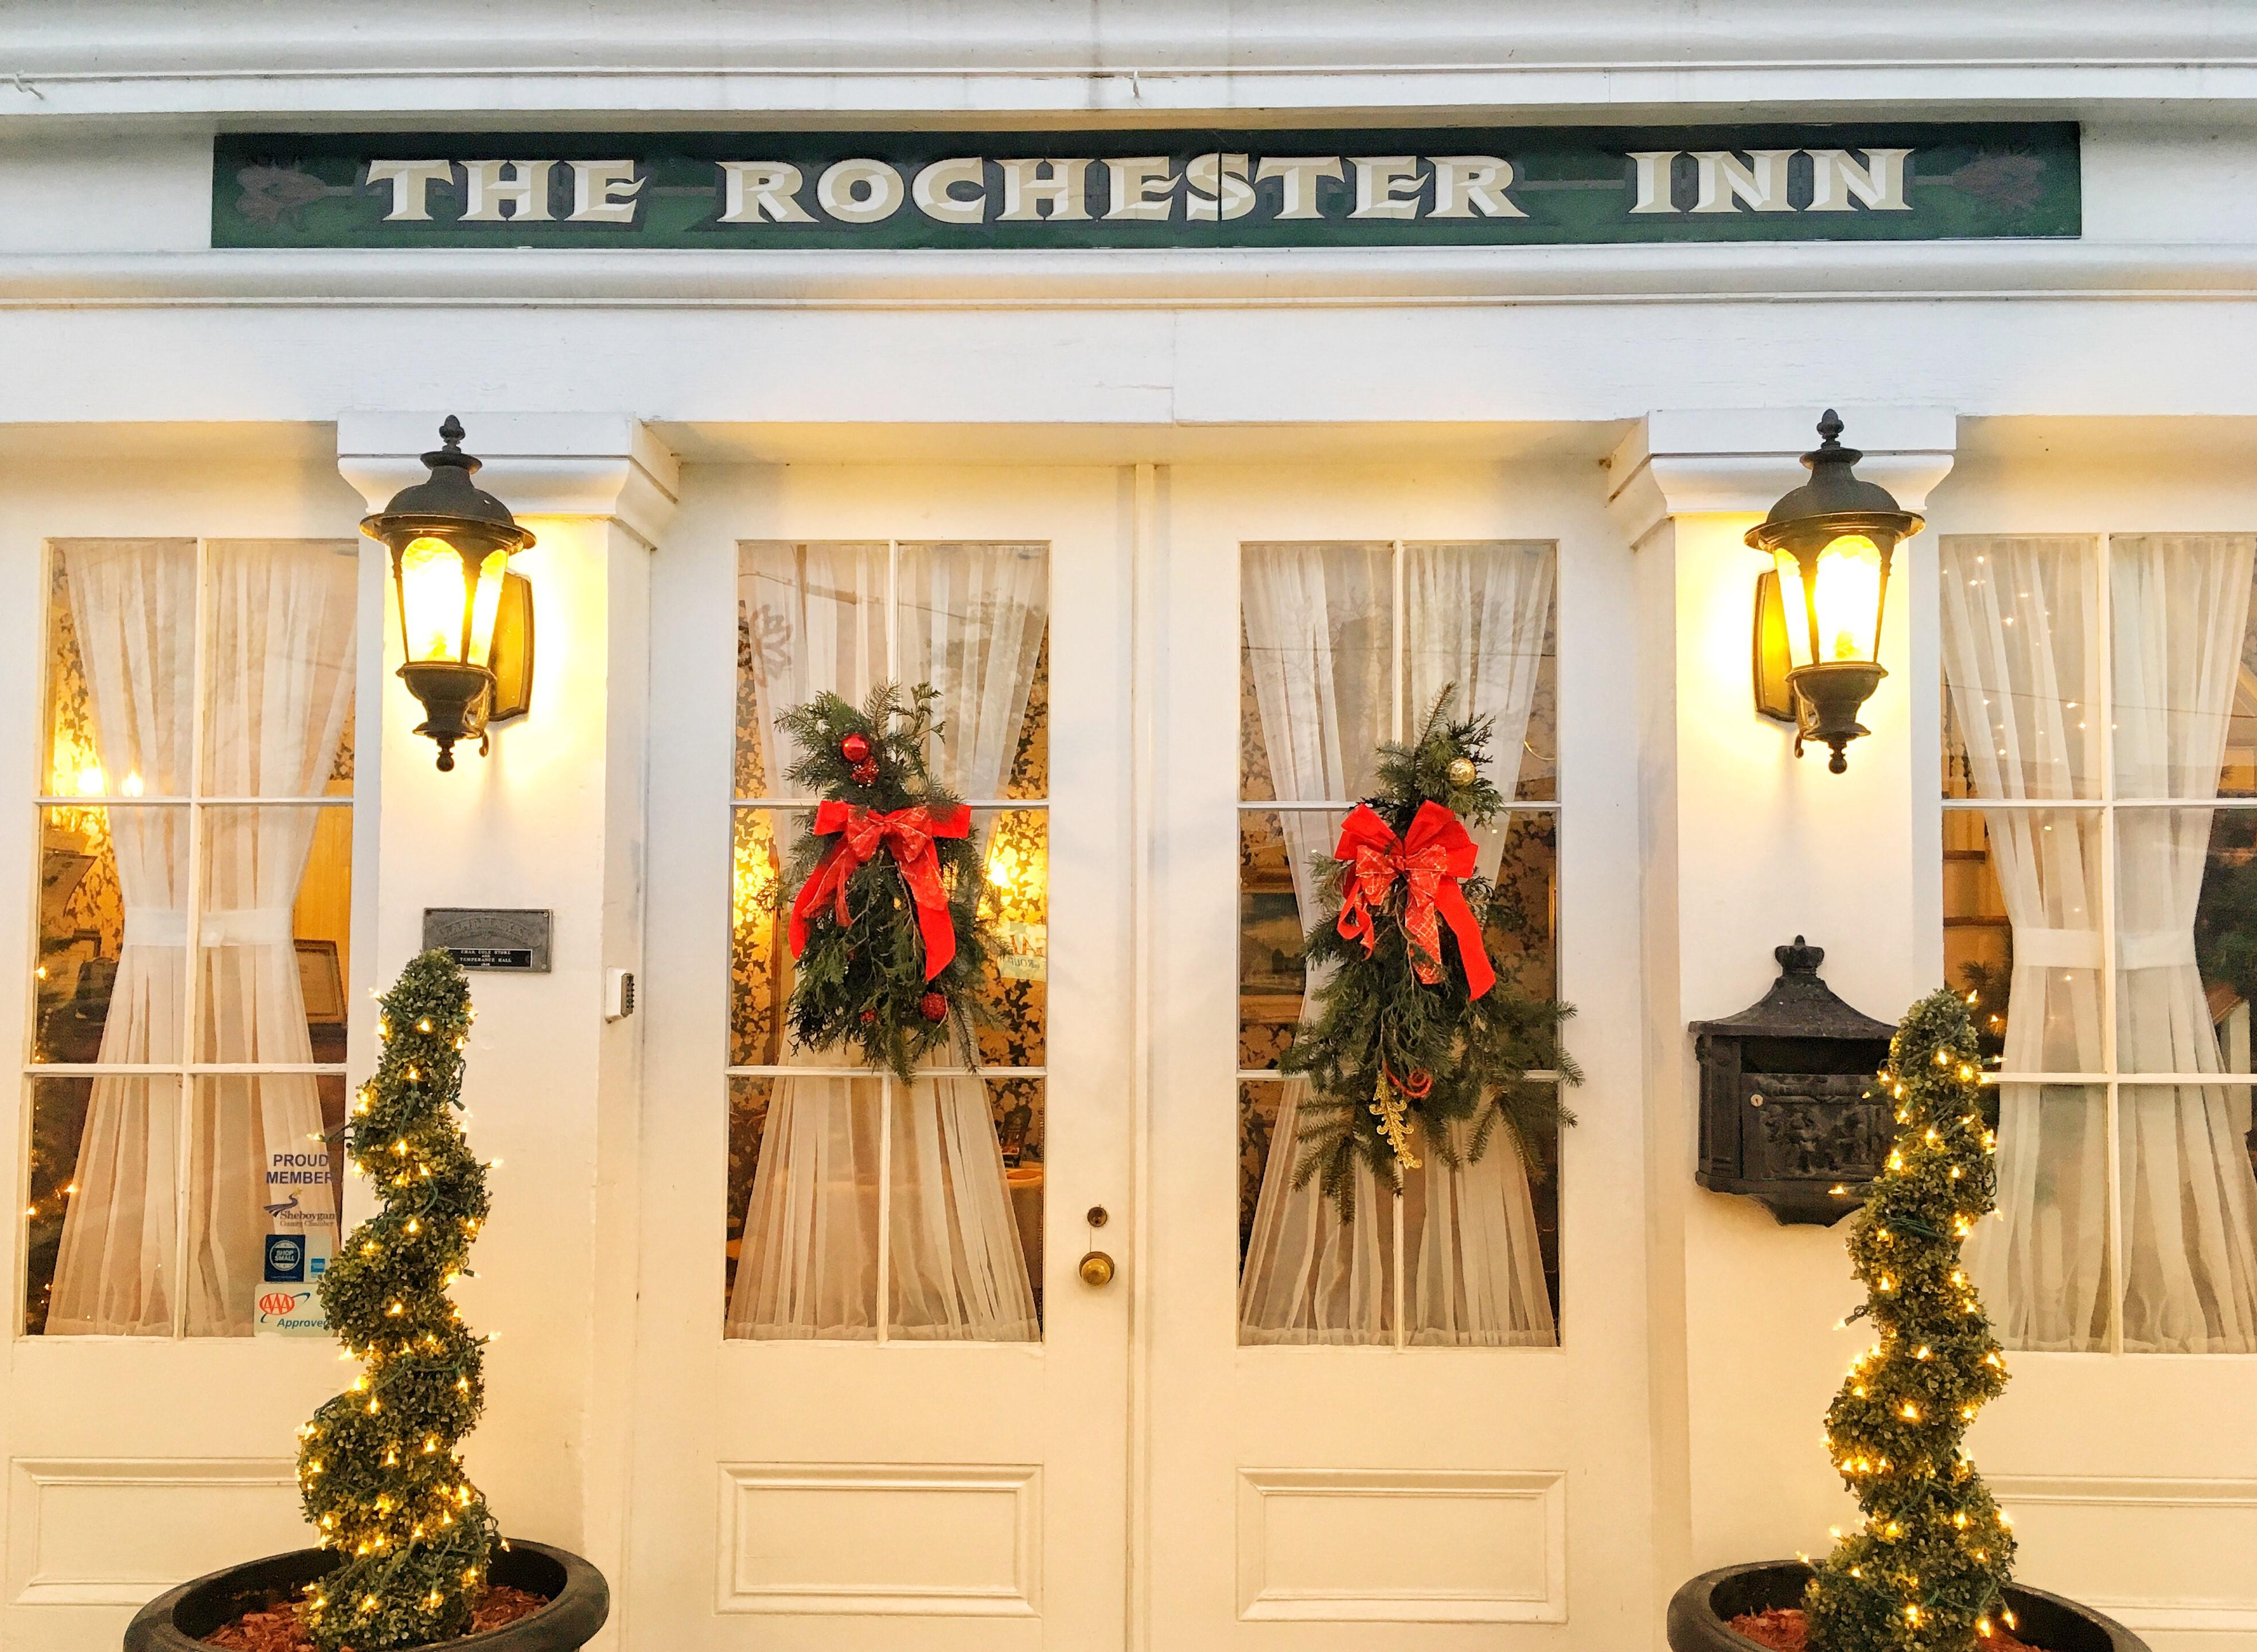 The Rochester Inn holiday season